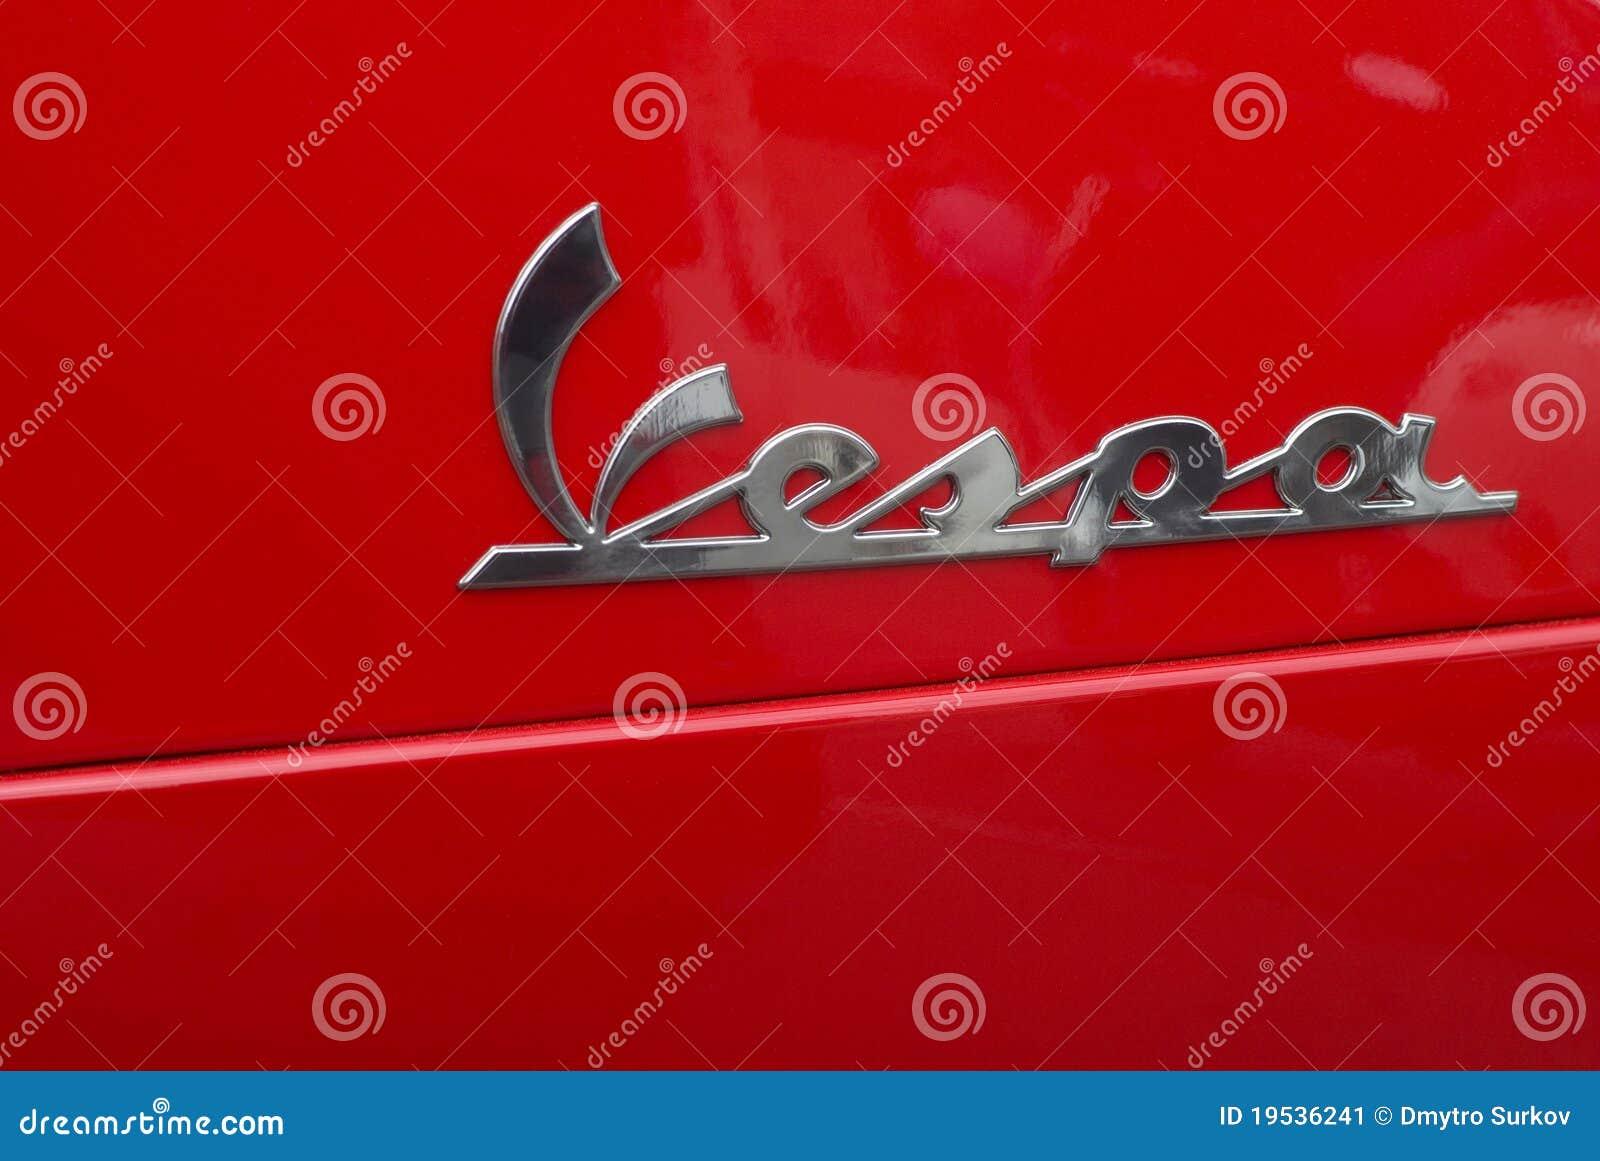 vespa italian scooter logo editorial photo - image: 19536241